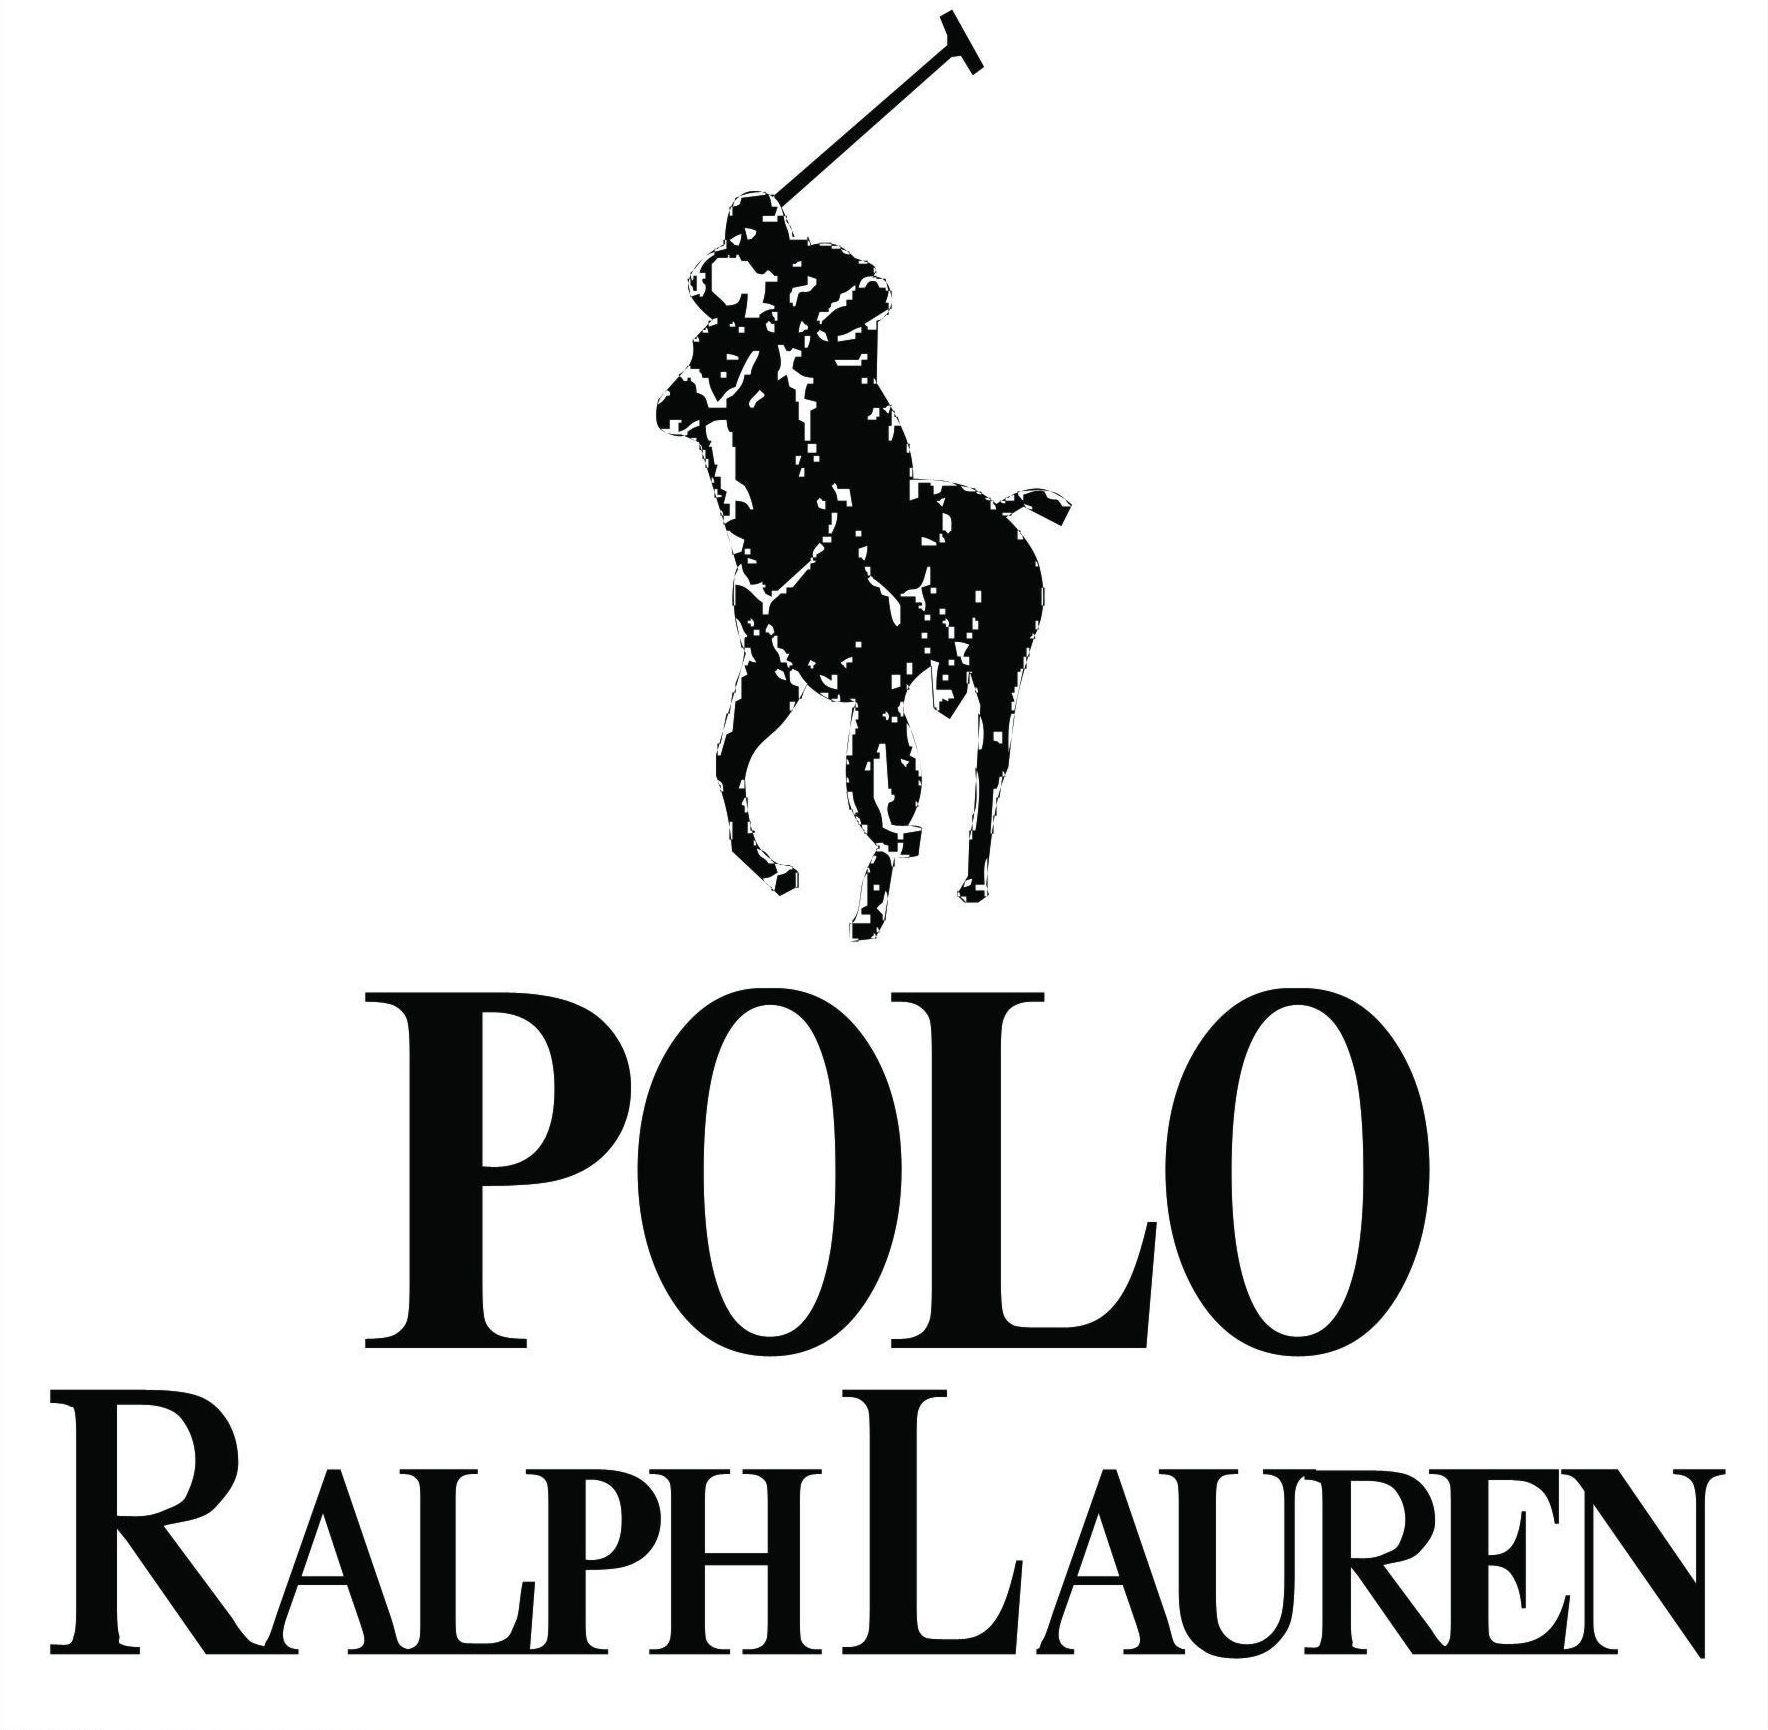 new product eadf6 c4b80 44+] Polo Ralph Lauren Phone Wallpaper on WallpaperSafari